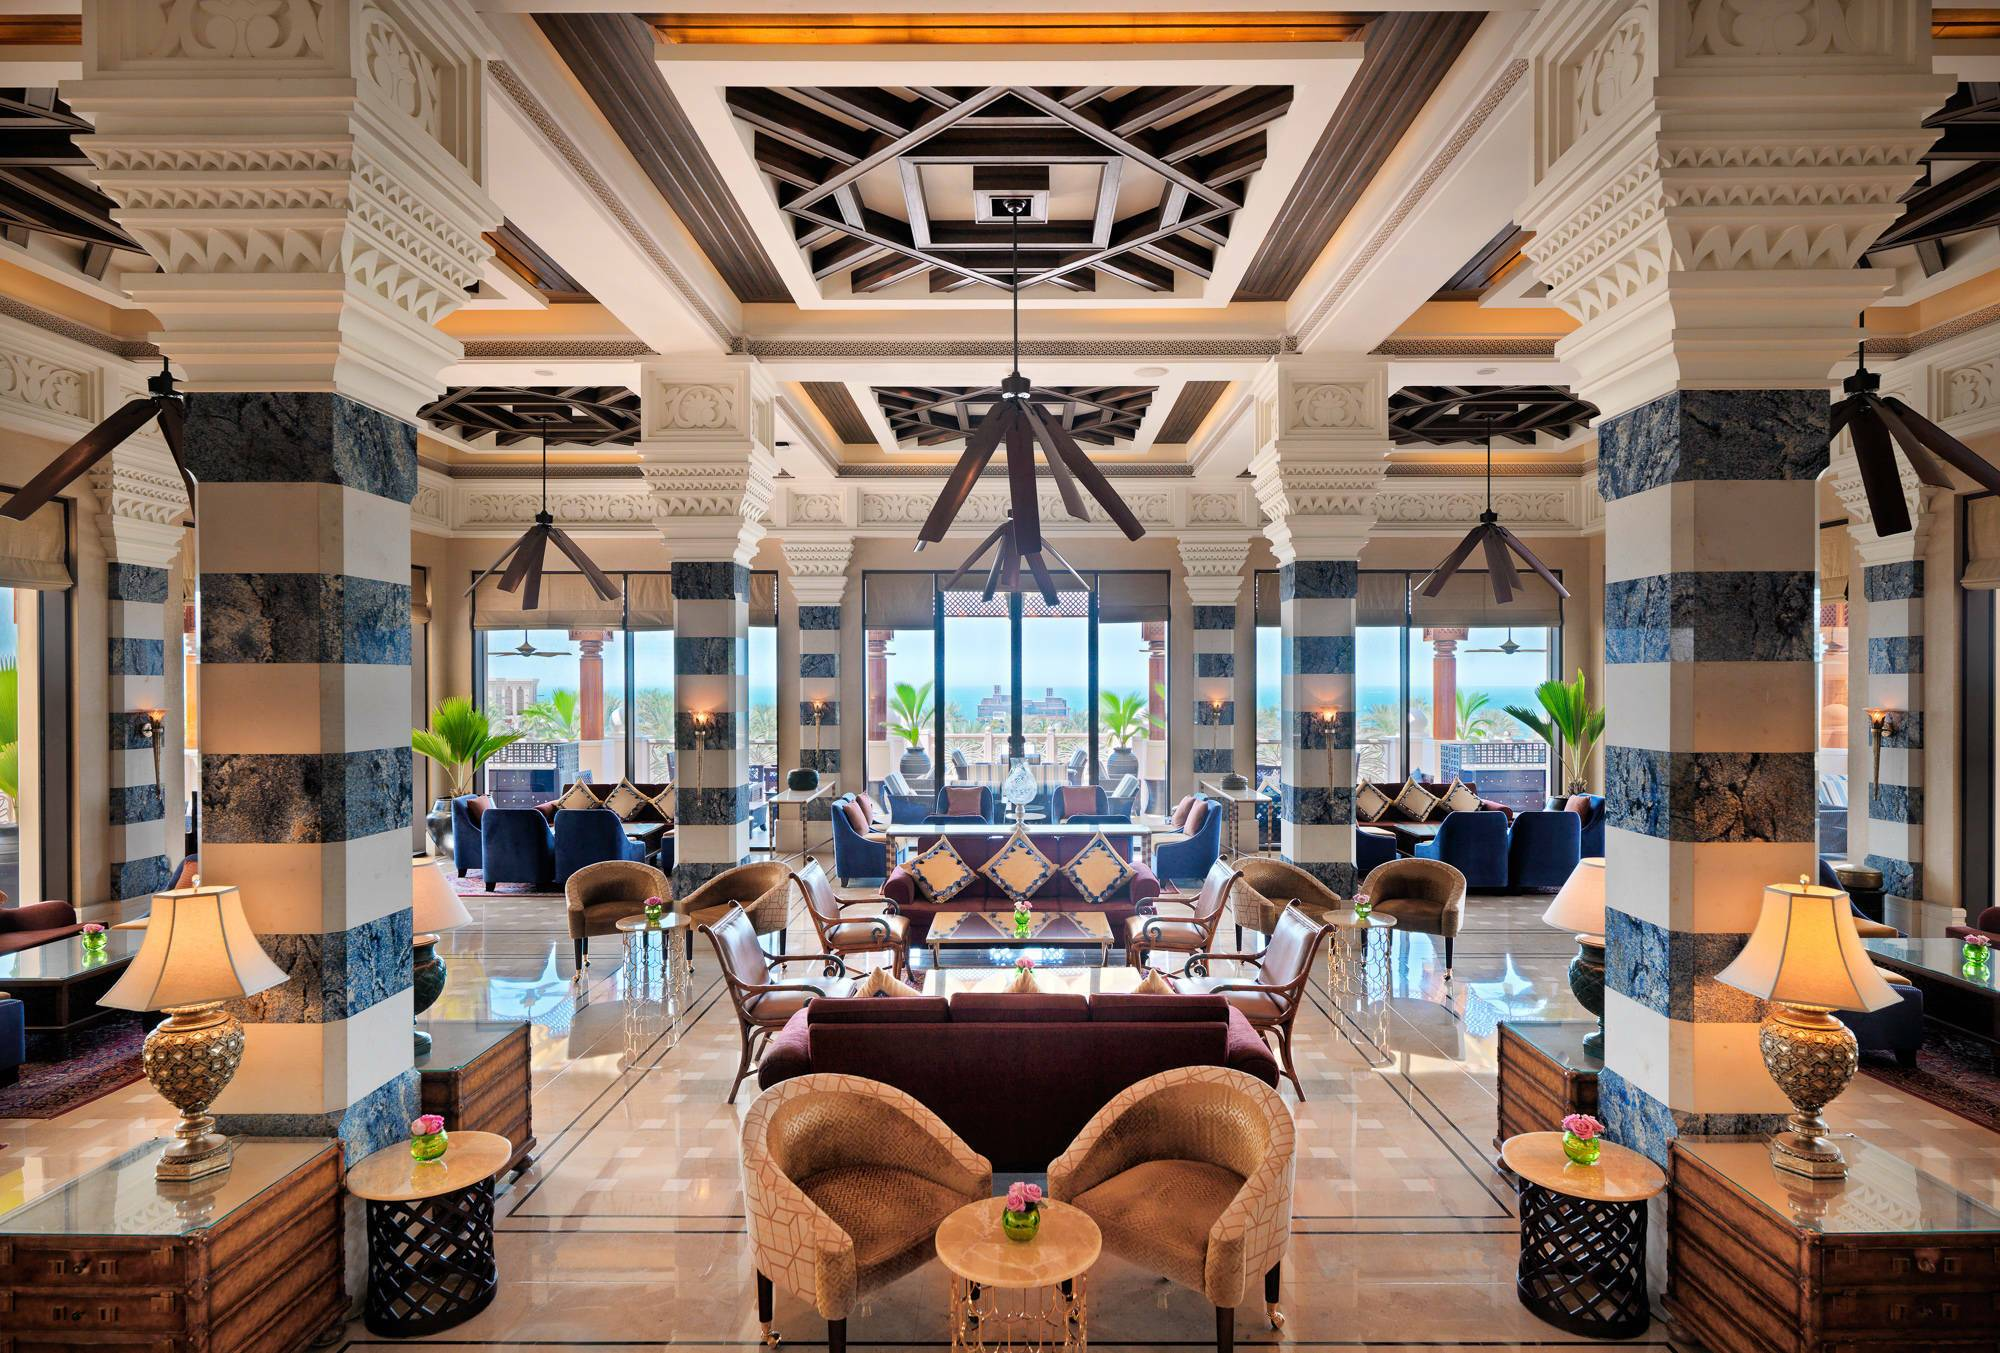 Jumeirah al Qasr Dubai al fayrooz lounge